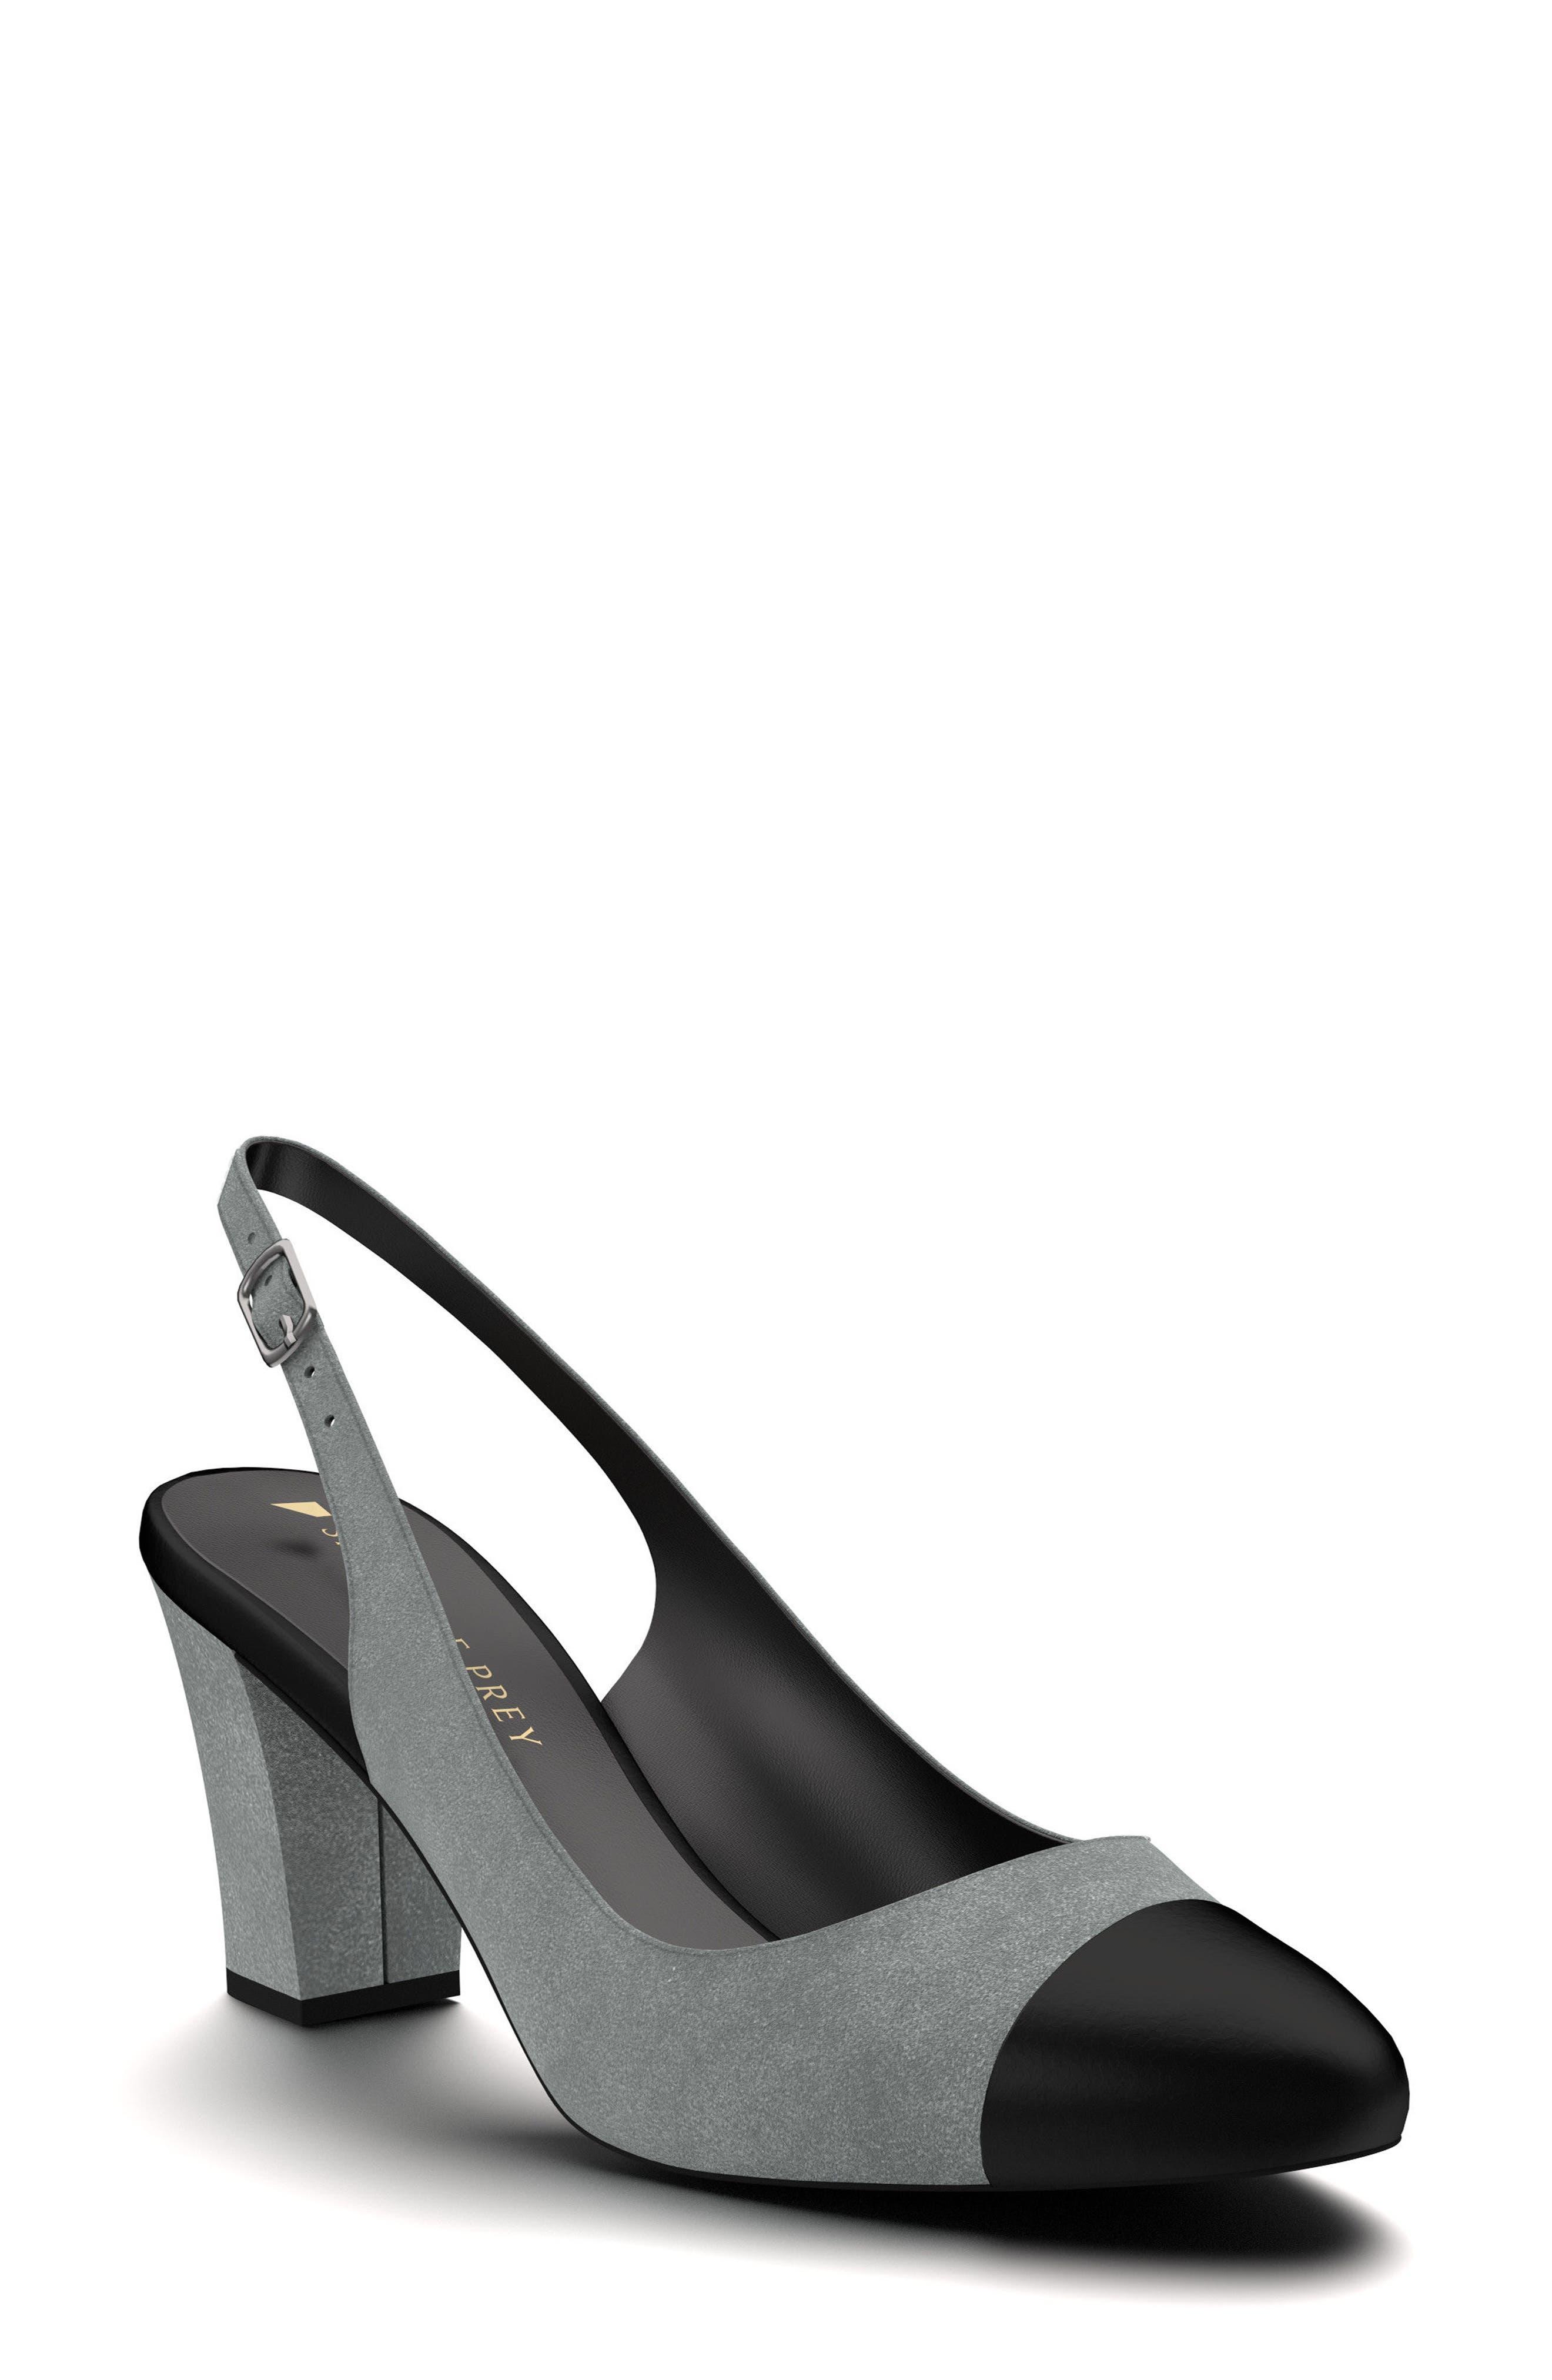 Main Image - Shoes of Prey Slingback Pump (Women)